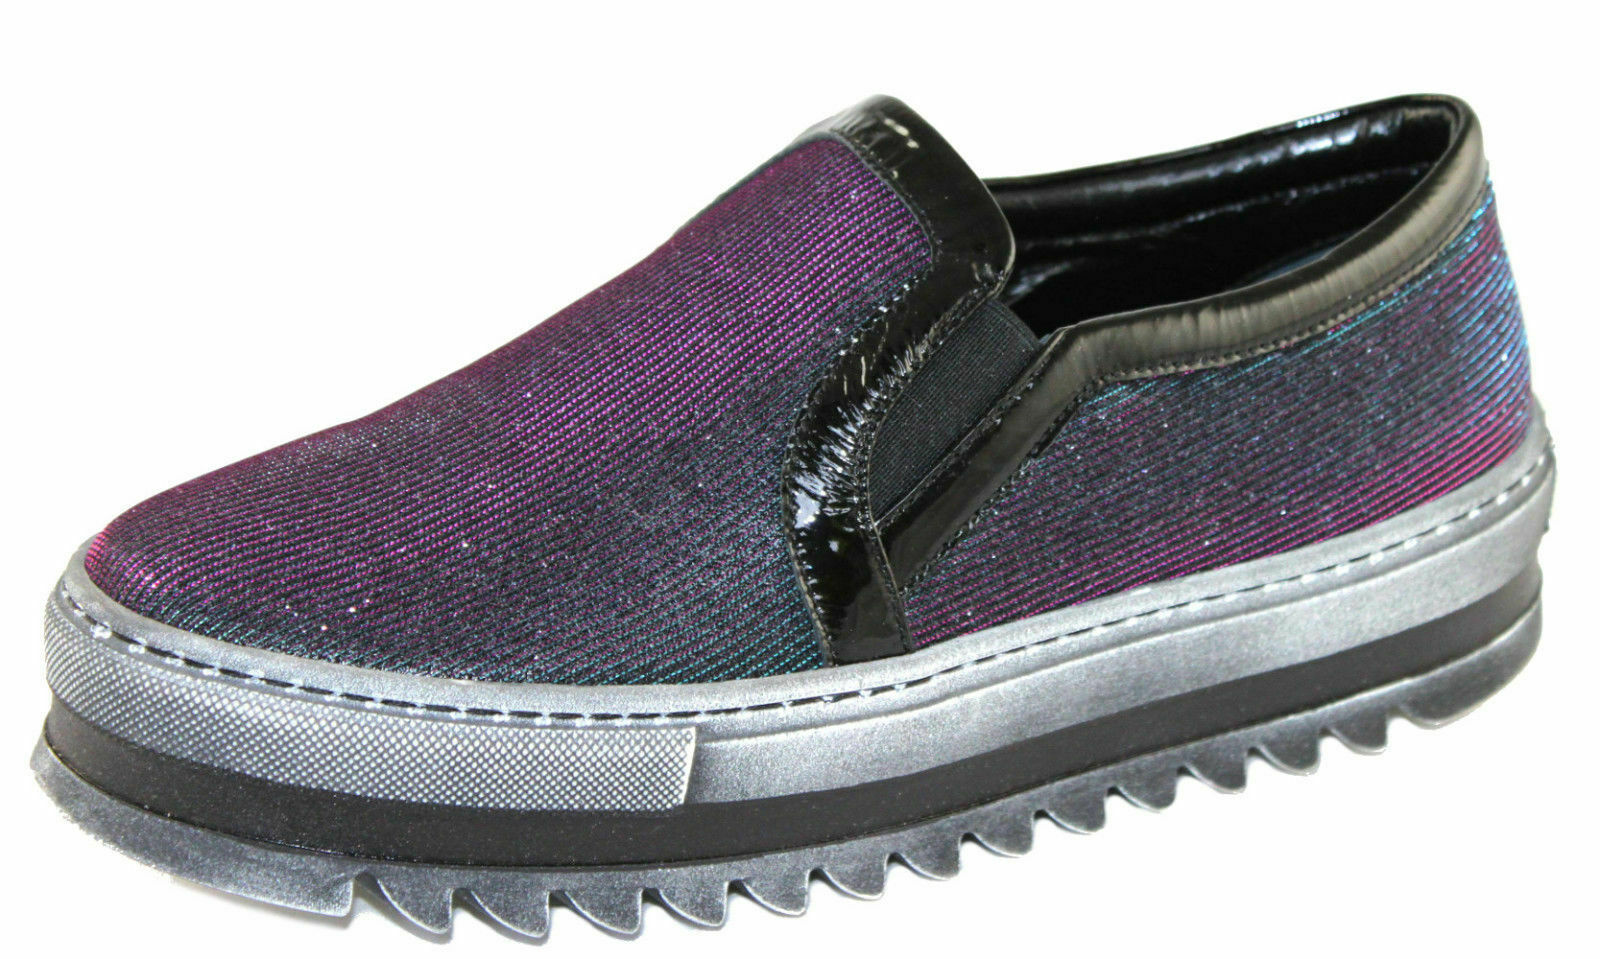 Spaziomoda womens loafers slip - on sneakers size 38 s603 black purple